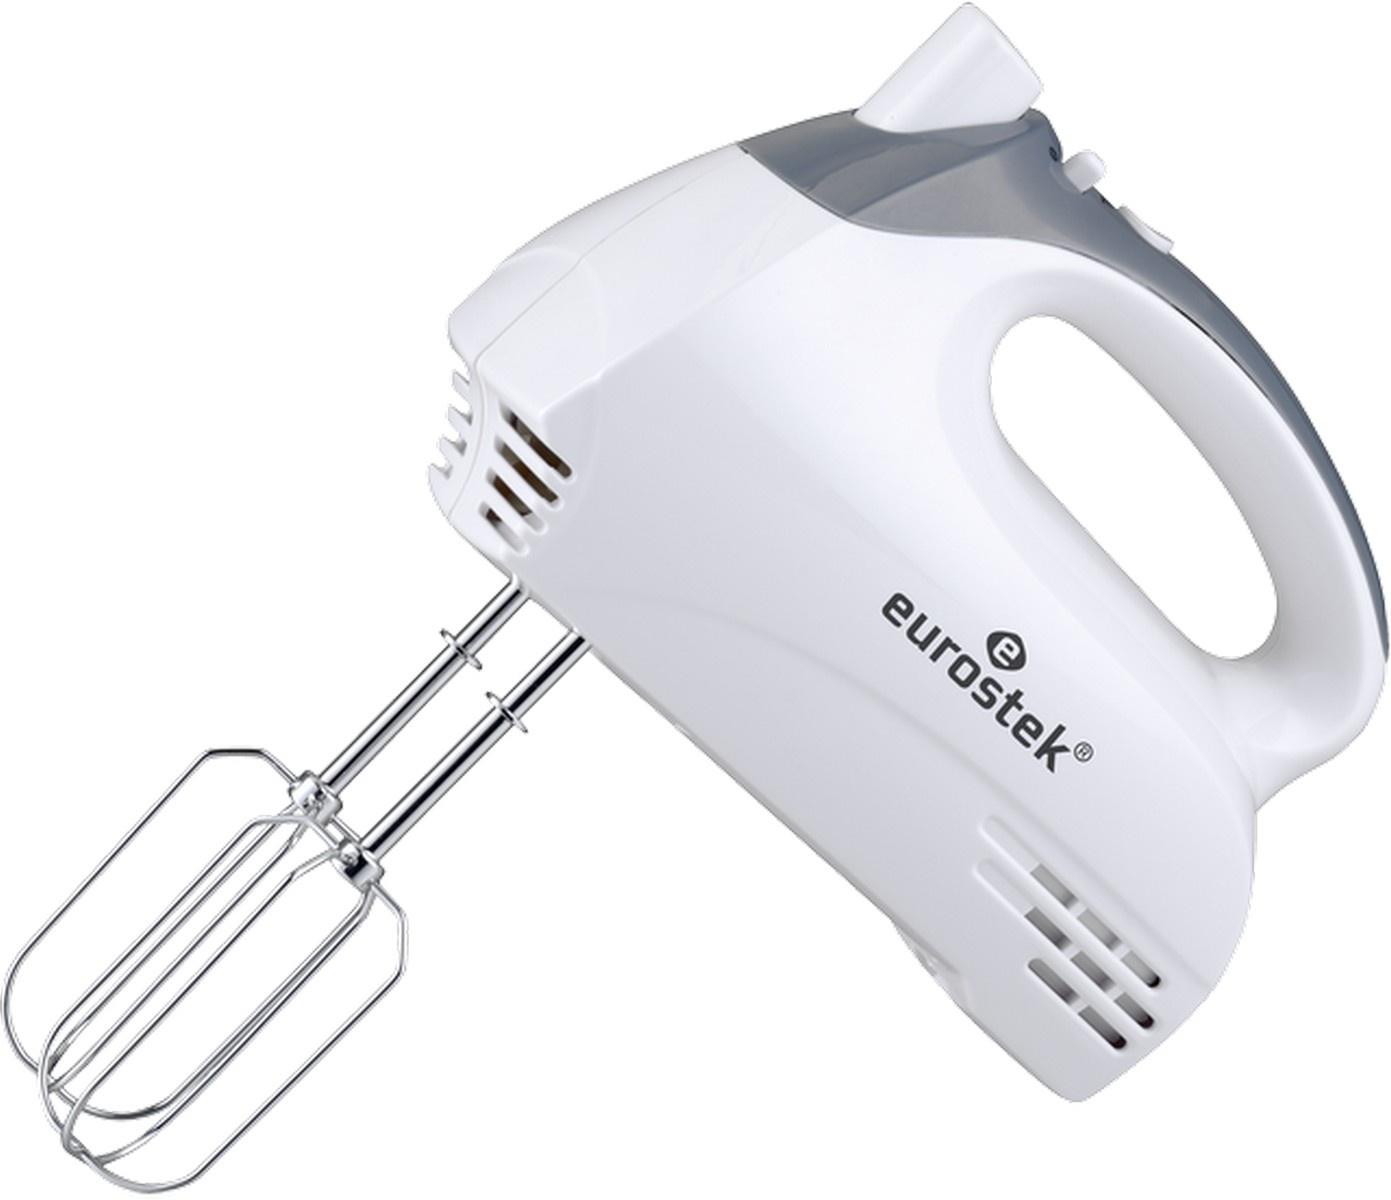 Миксер Eurostek EHM-355, EHM-355, белый